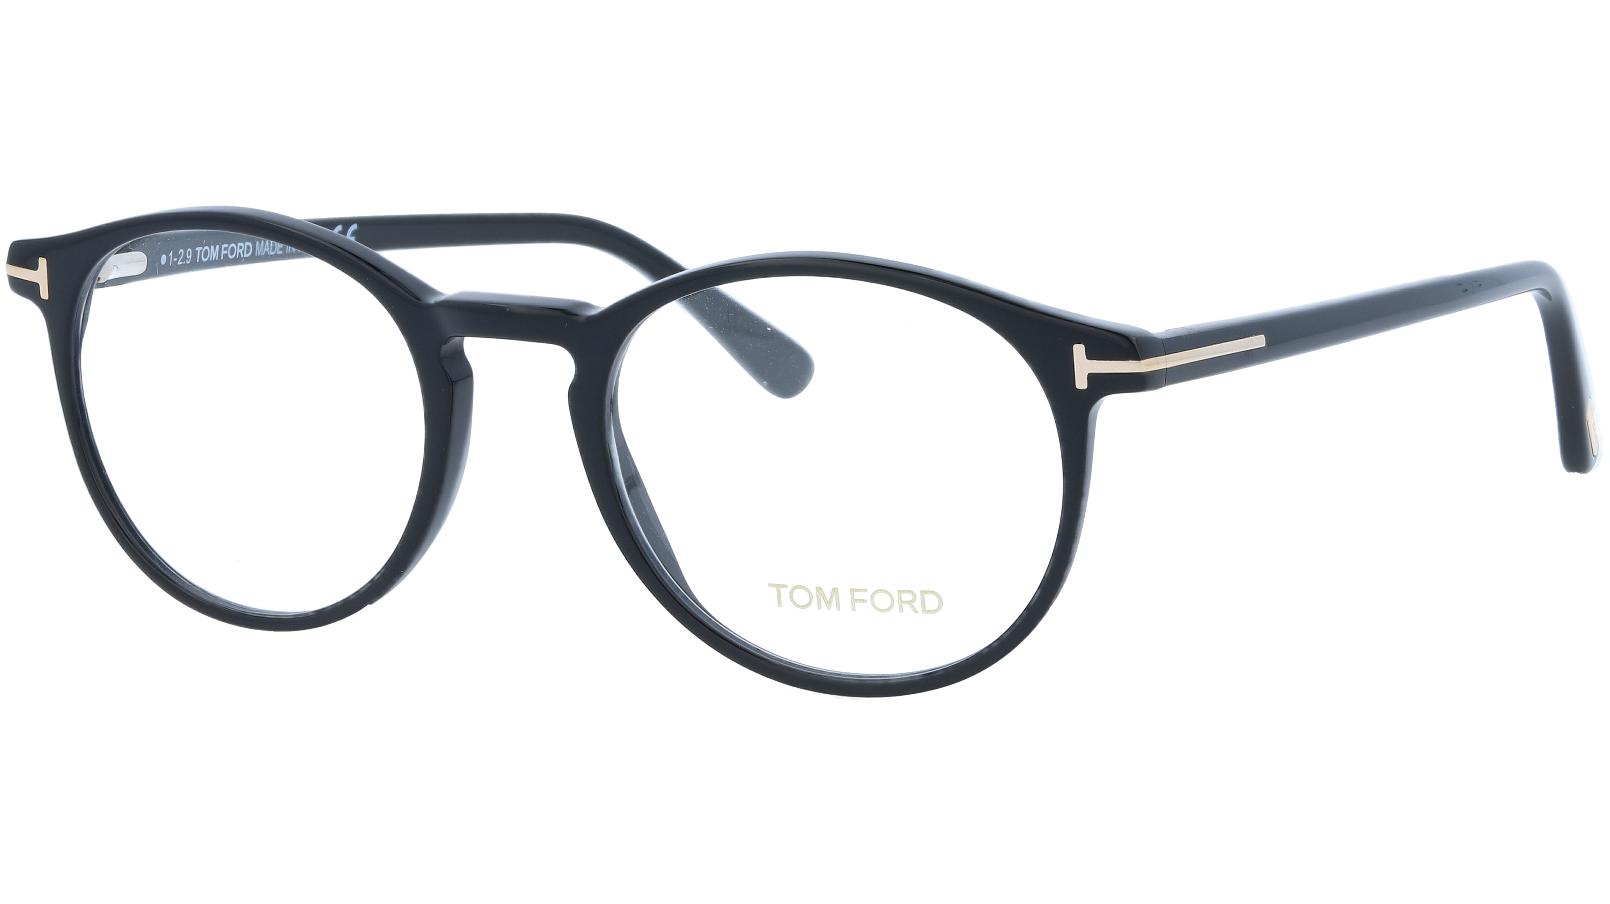 Tom Ford TF5294 001 50 Black Glasses